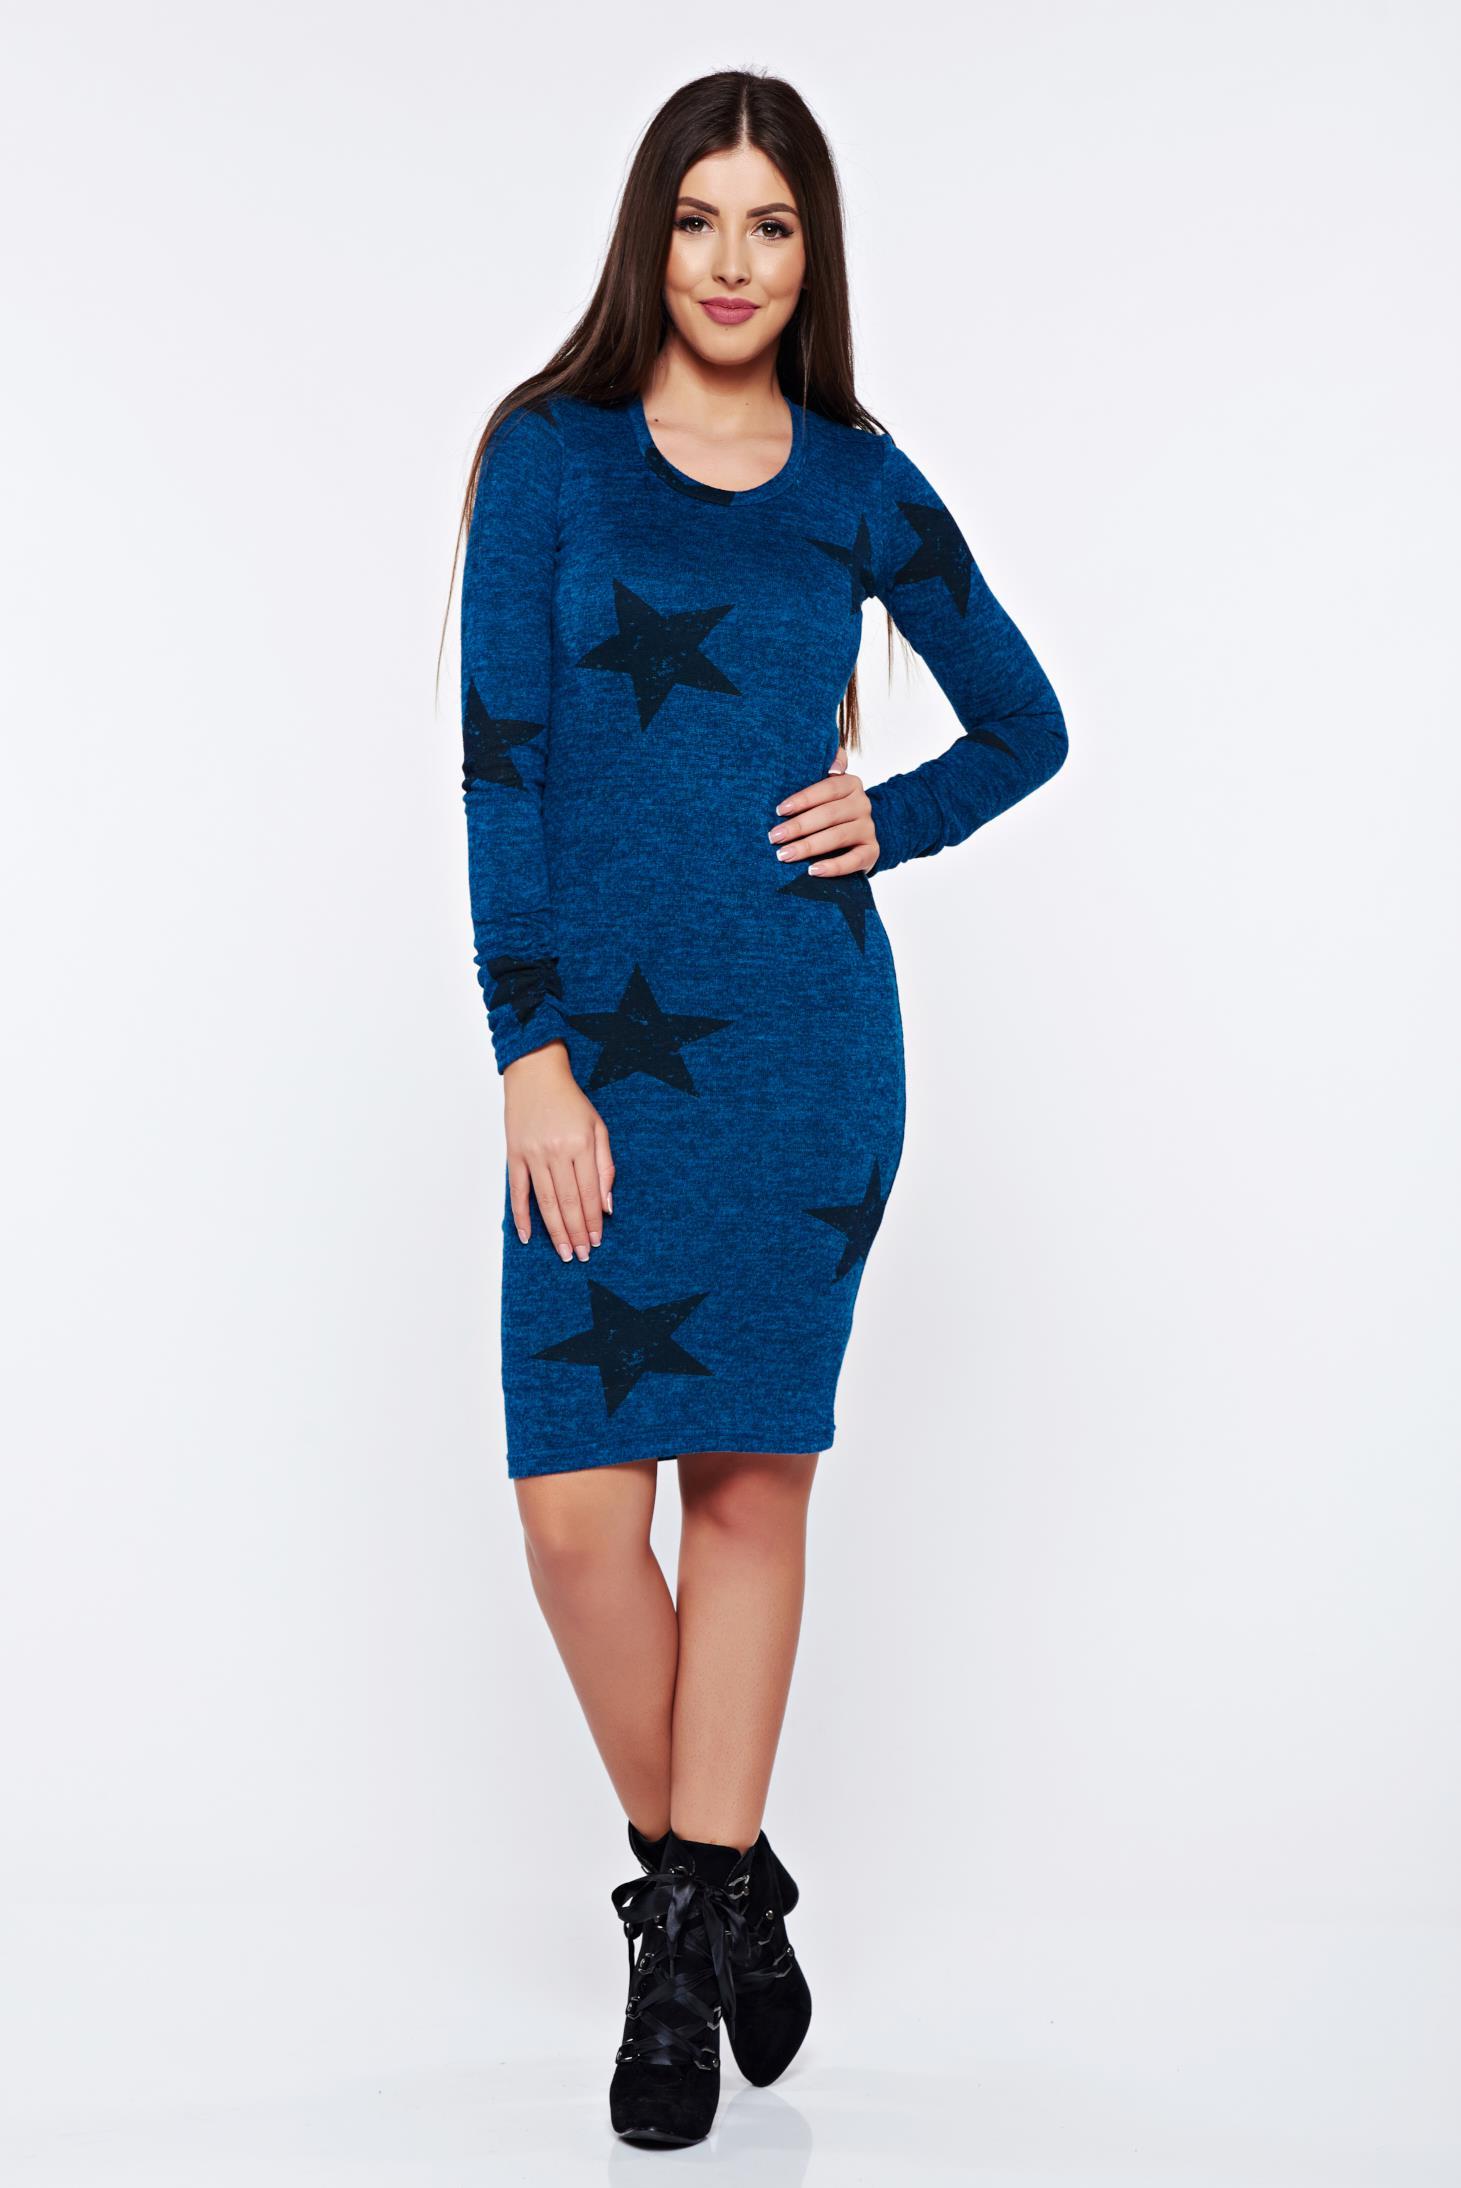 Rochie PrettyGirl turcoaz casual tip creion tricotata cu print